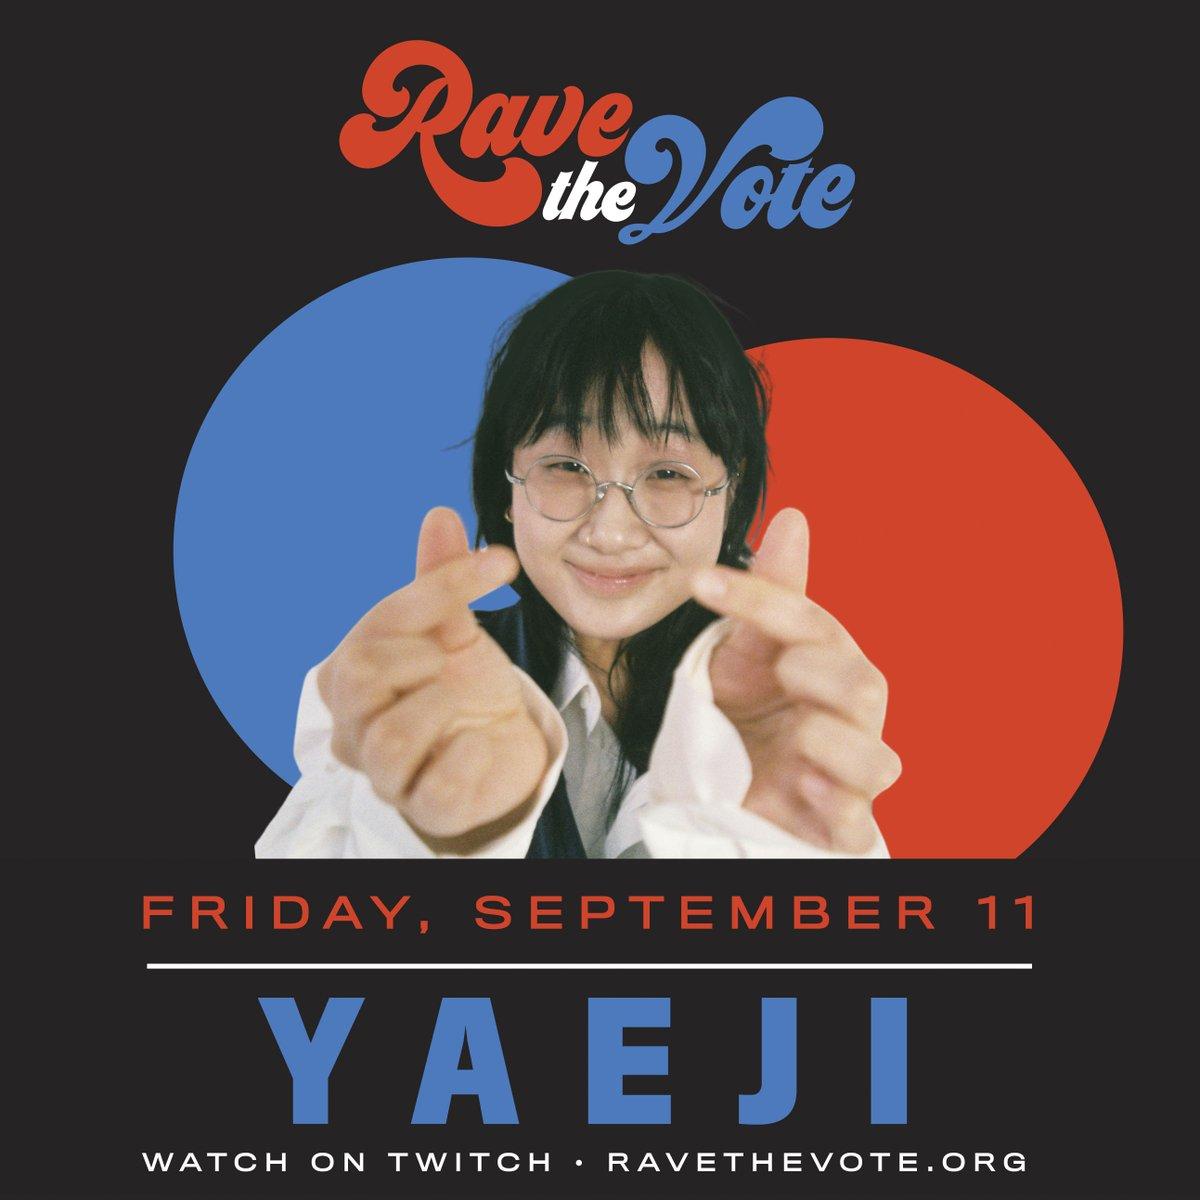 Catch @kraeji on @ravethevote tomorrow, Friday 11th September  🤩 https://t.co/rl9GoFPrBZ https://t.co/wqCTqa8W6M